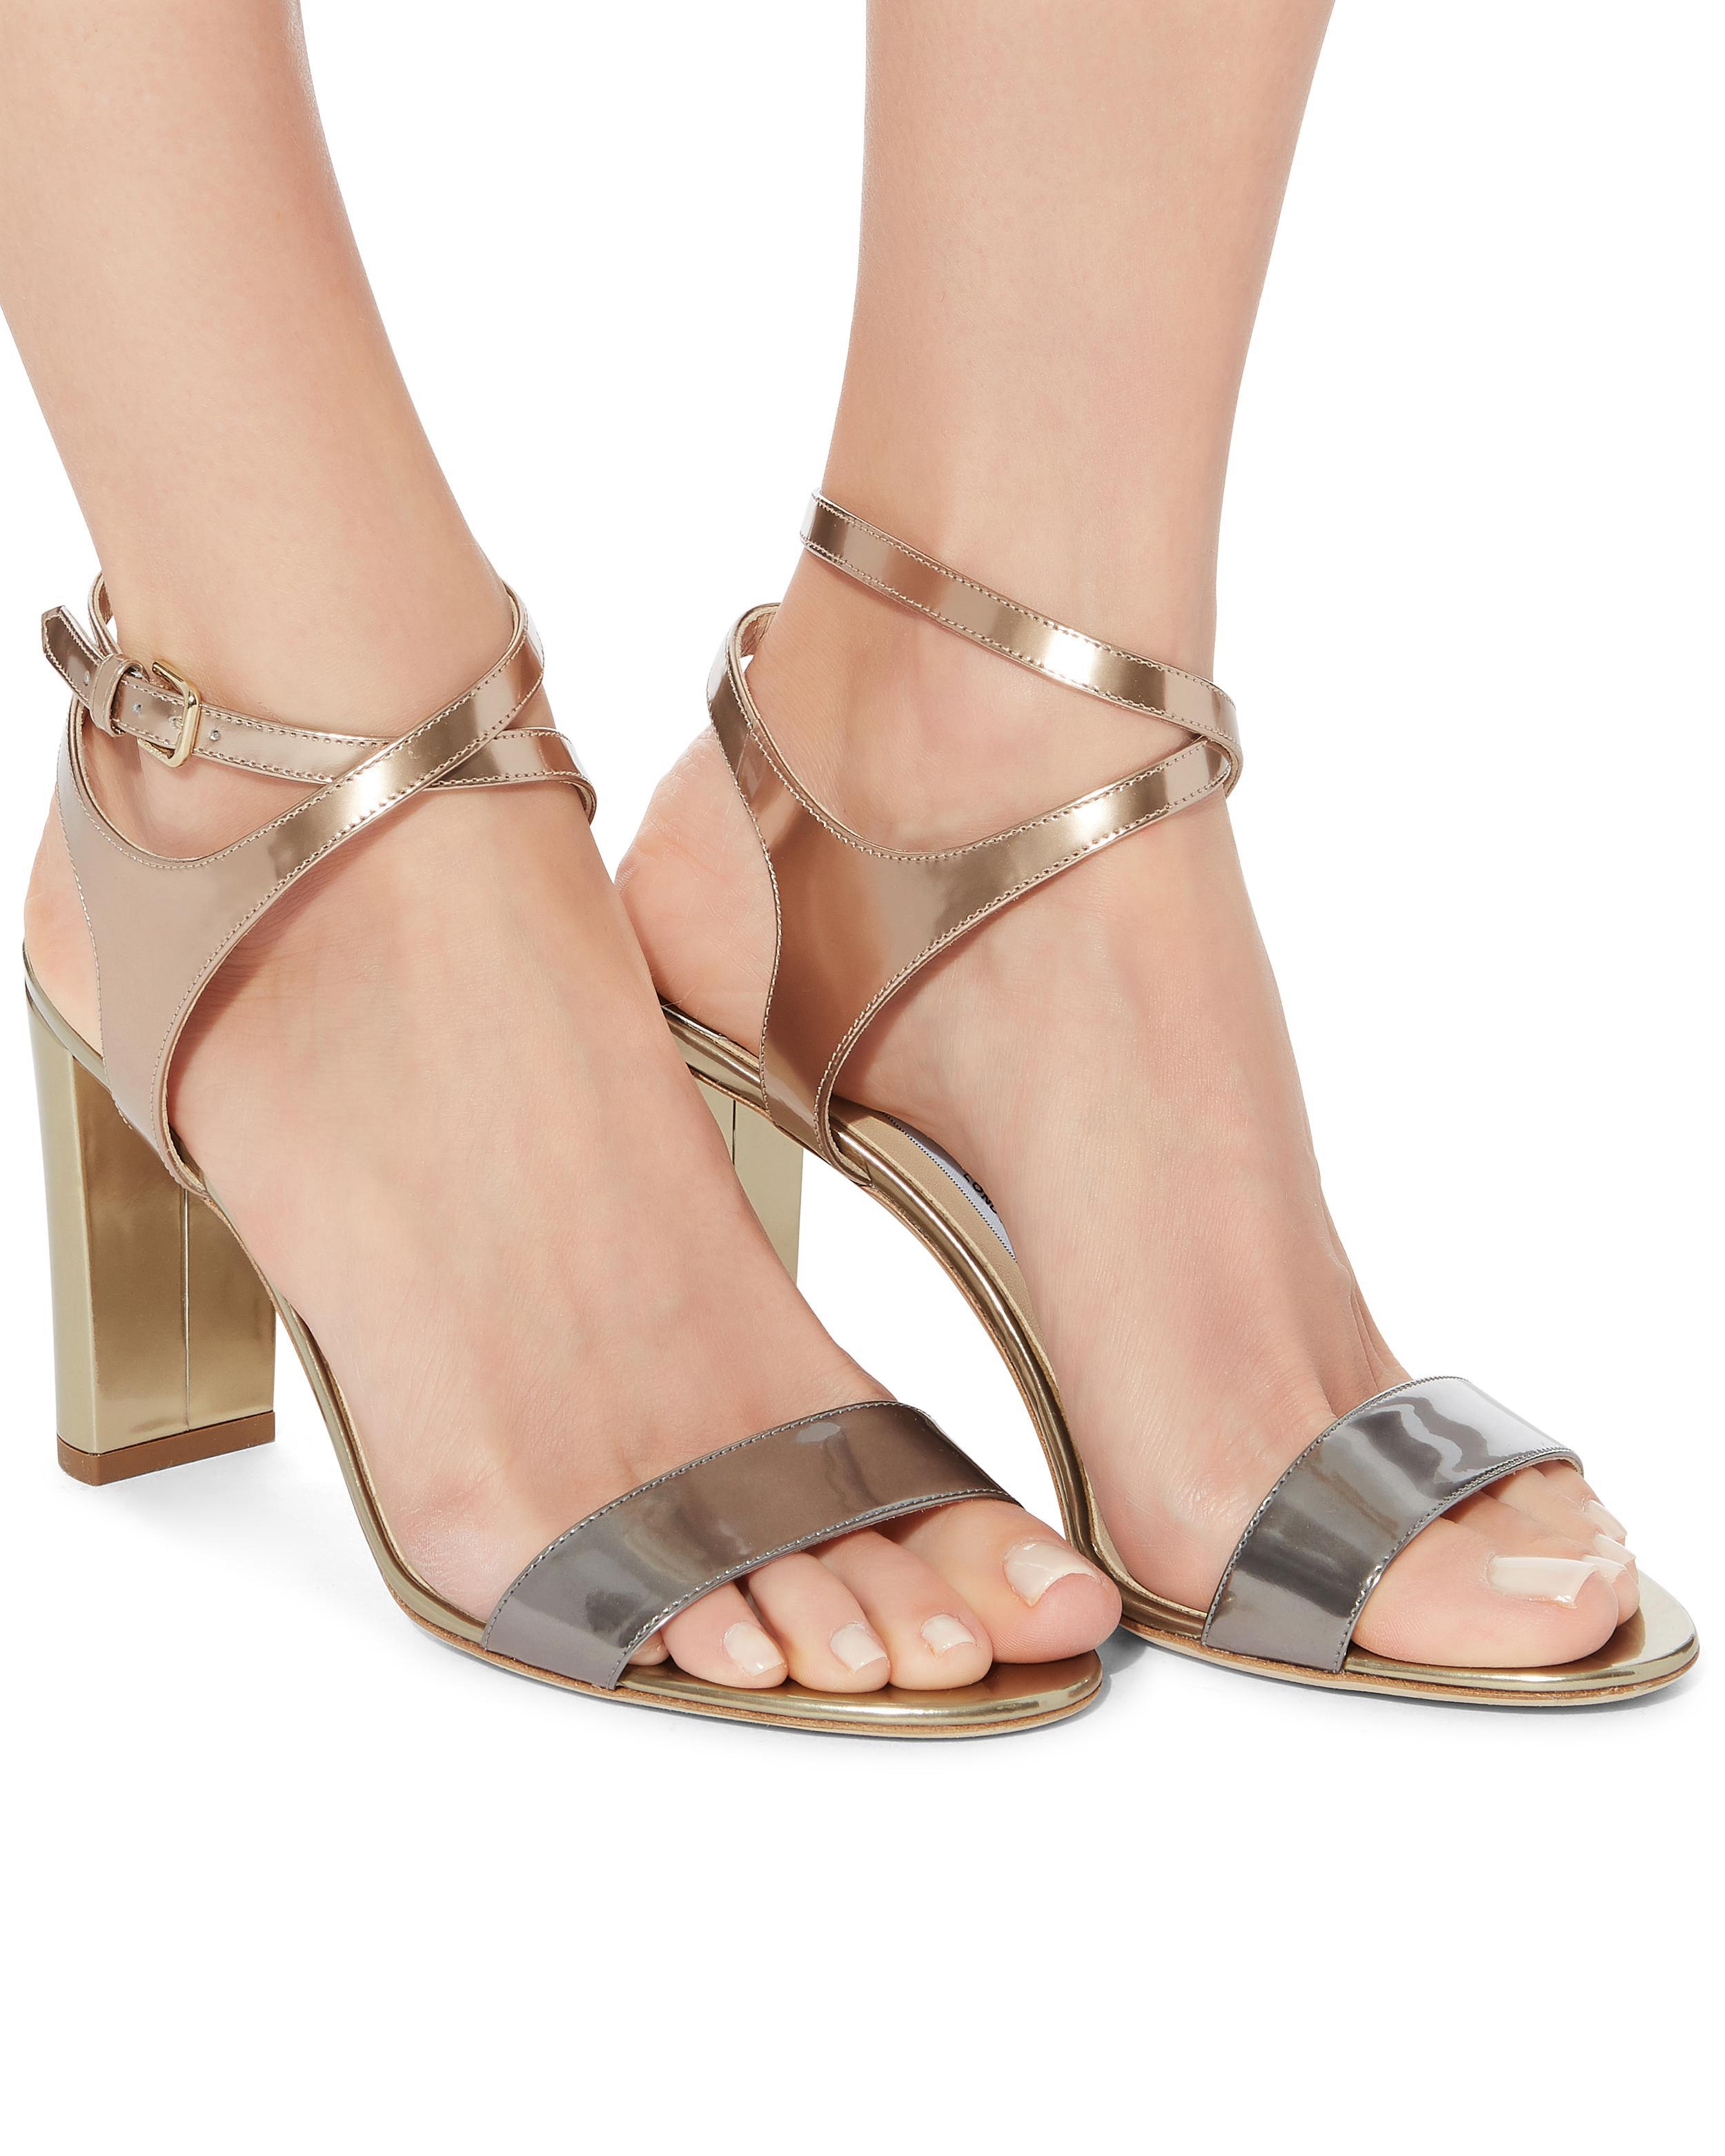 8ad0e4149dc Lyst - Jimmy Choo Marine Metallic High Sandals in Metallic